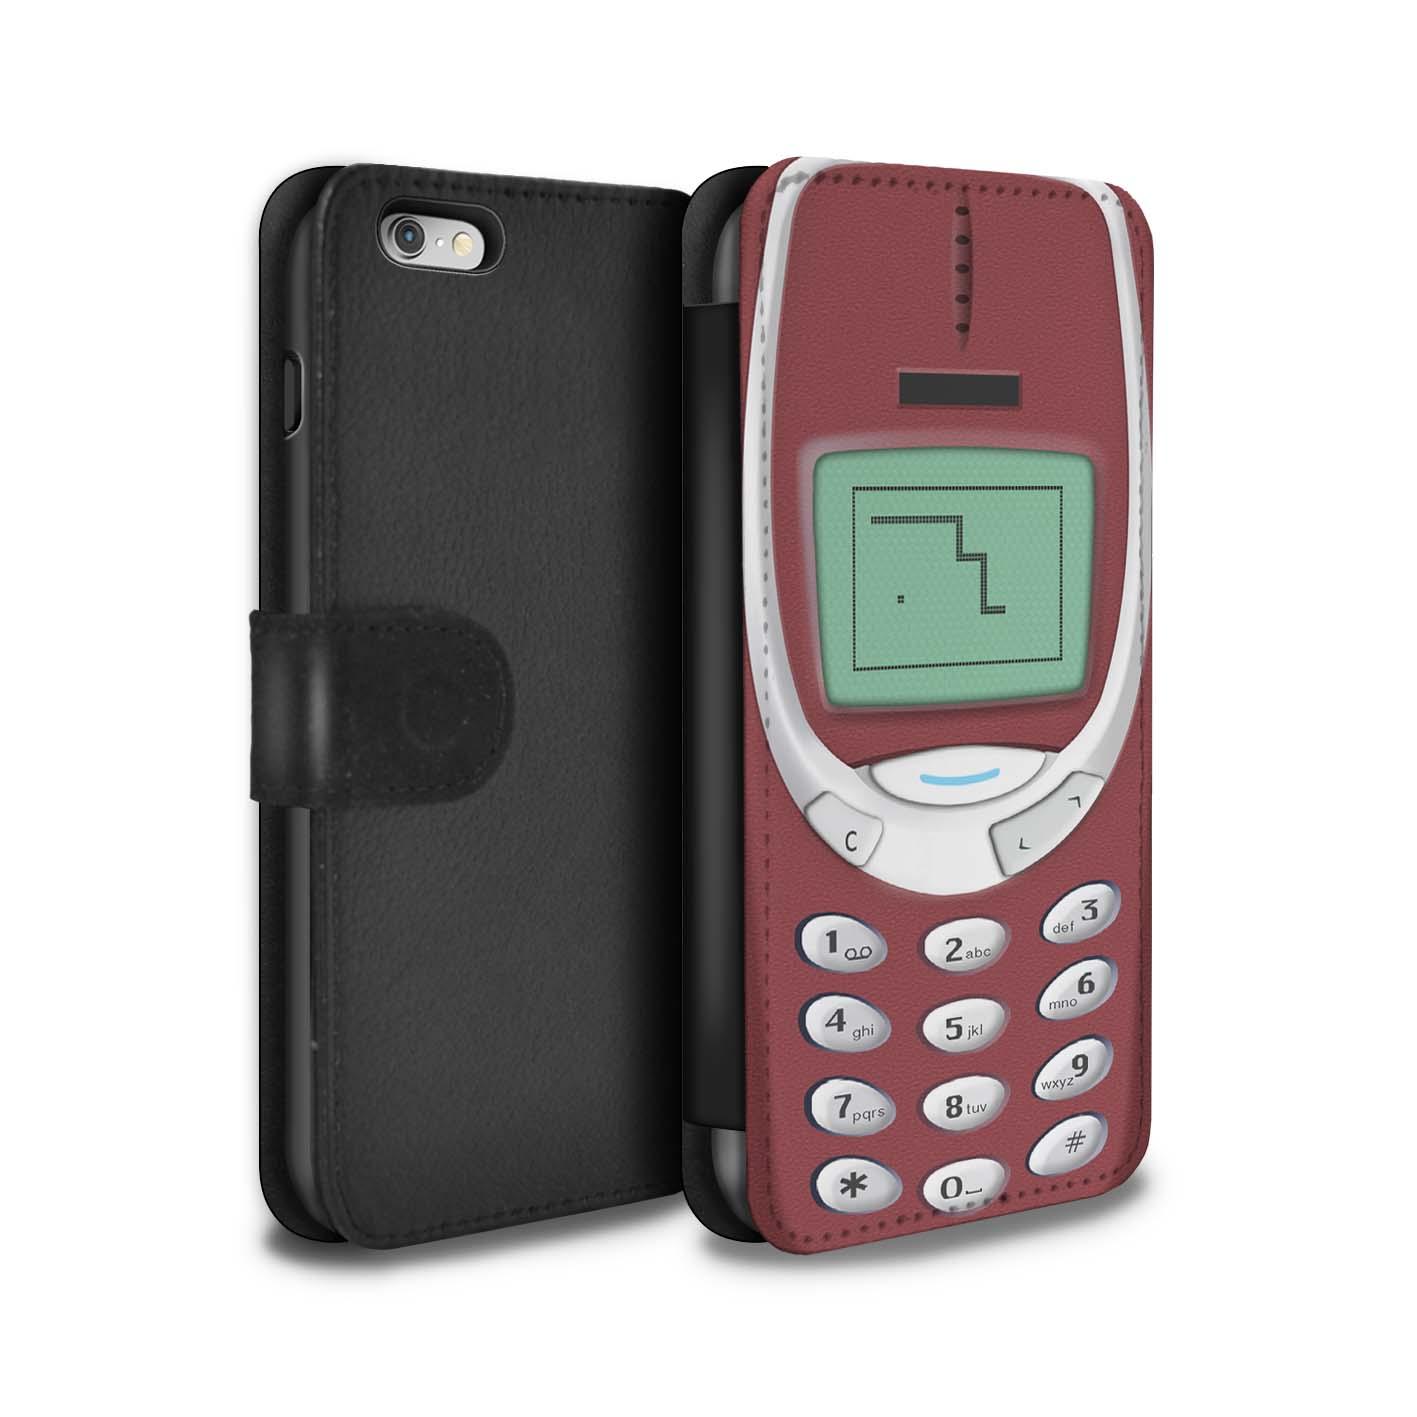 STUFF4-Coque-Etui-Case-Cuir-PU-pour-Apple-iPhone-6S-Plus-Portables-retro